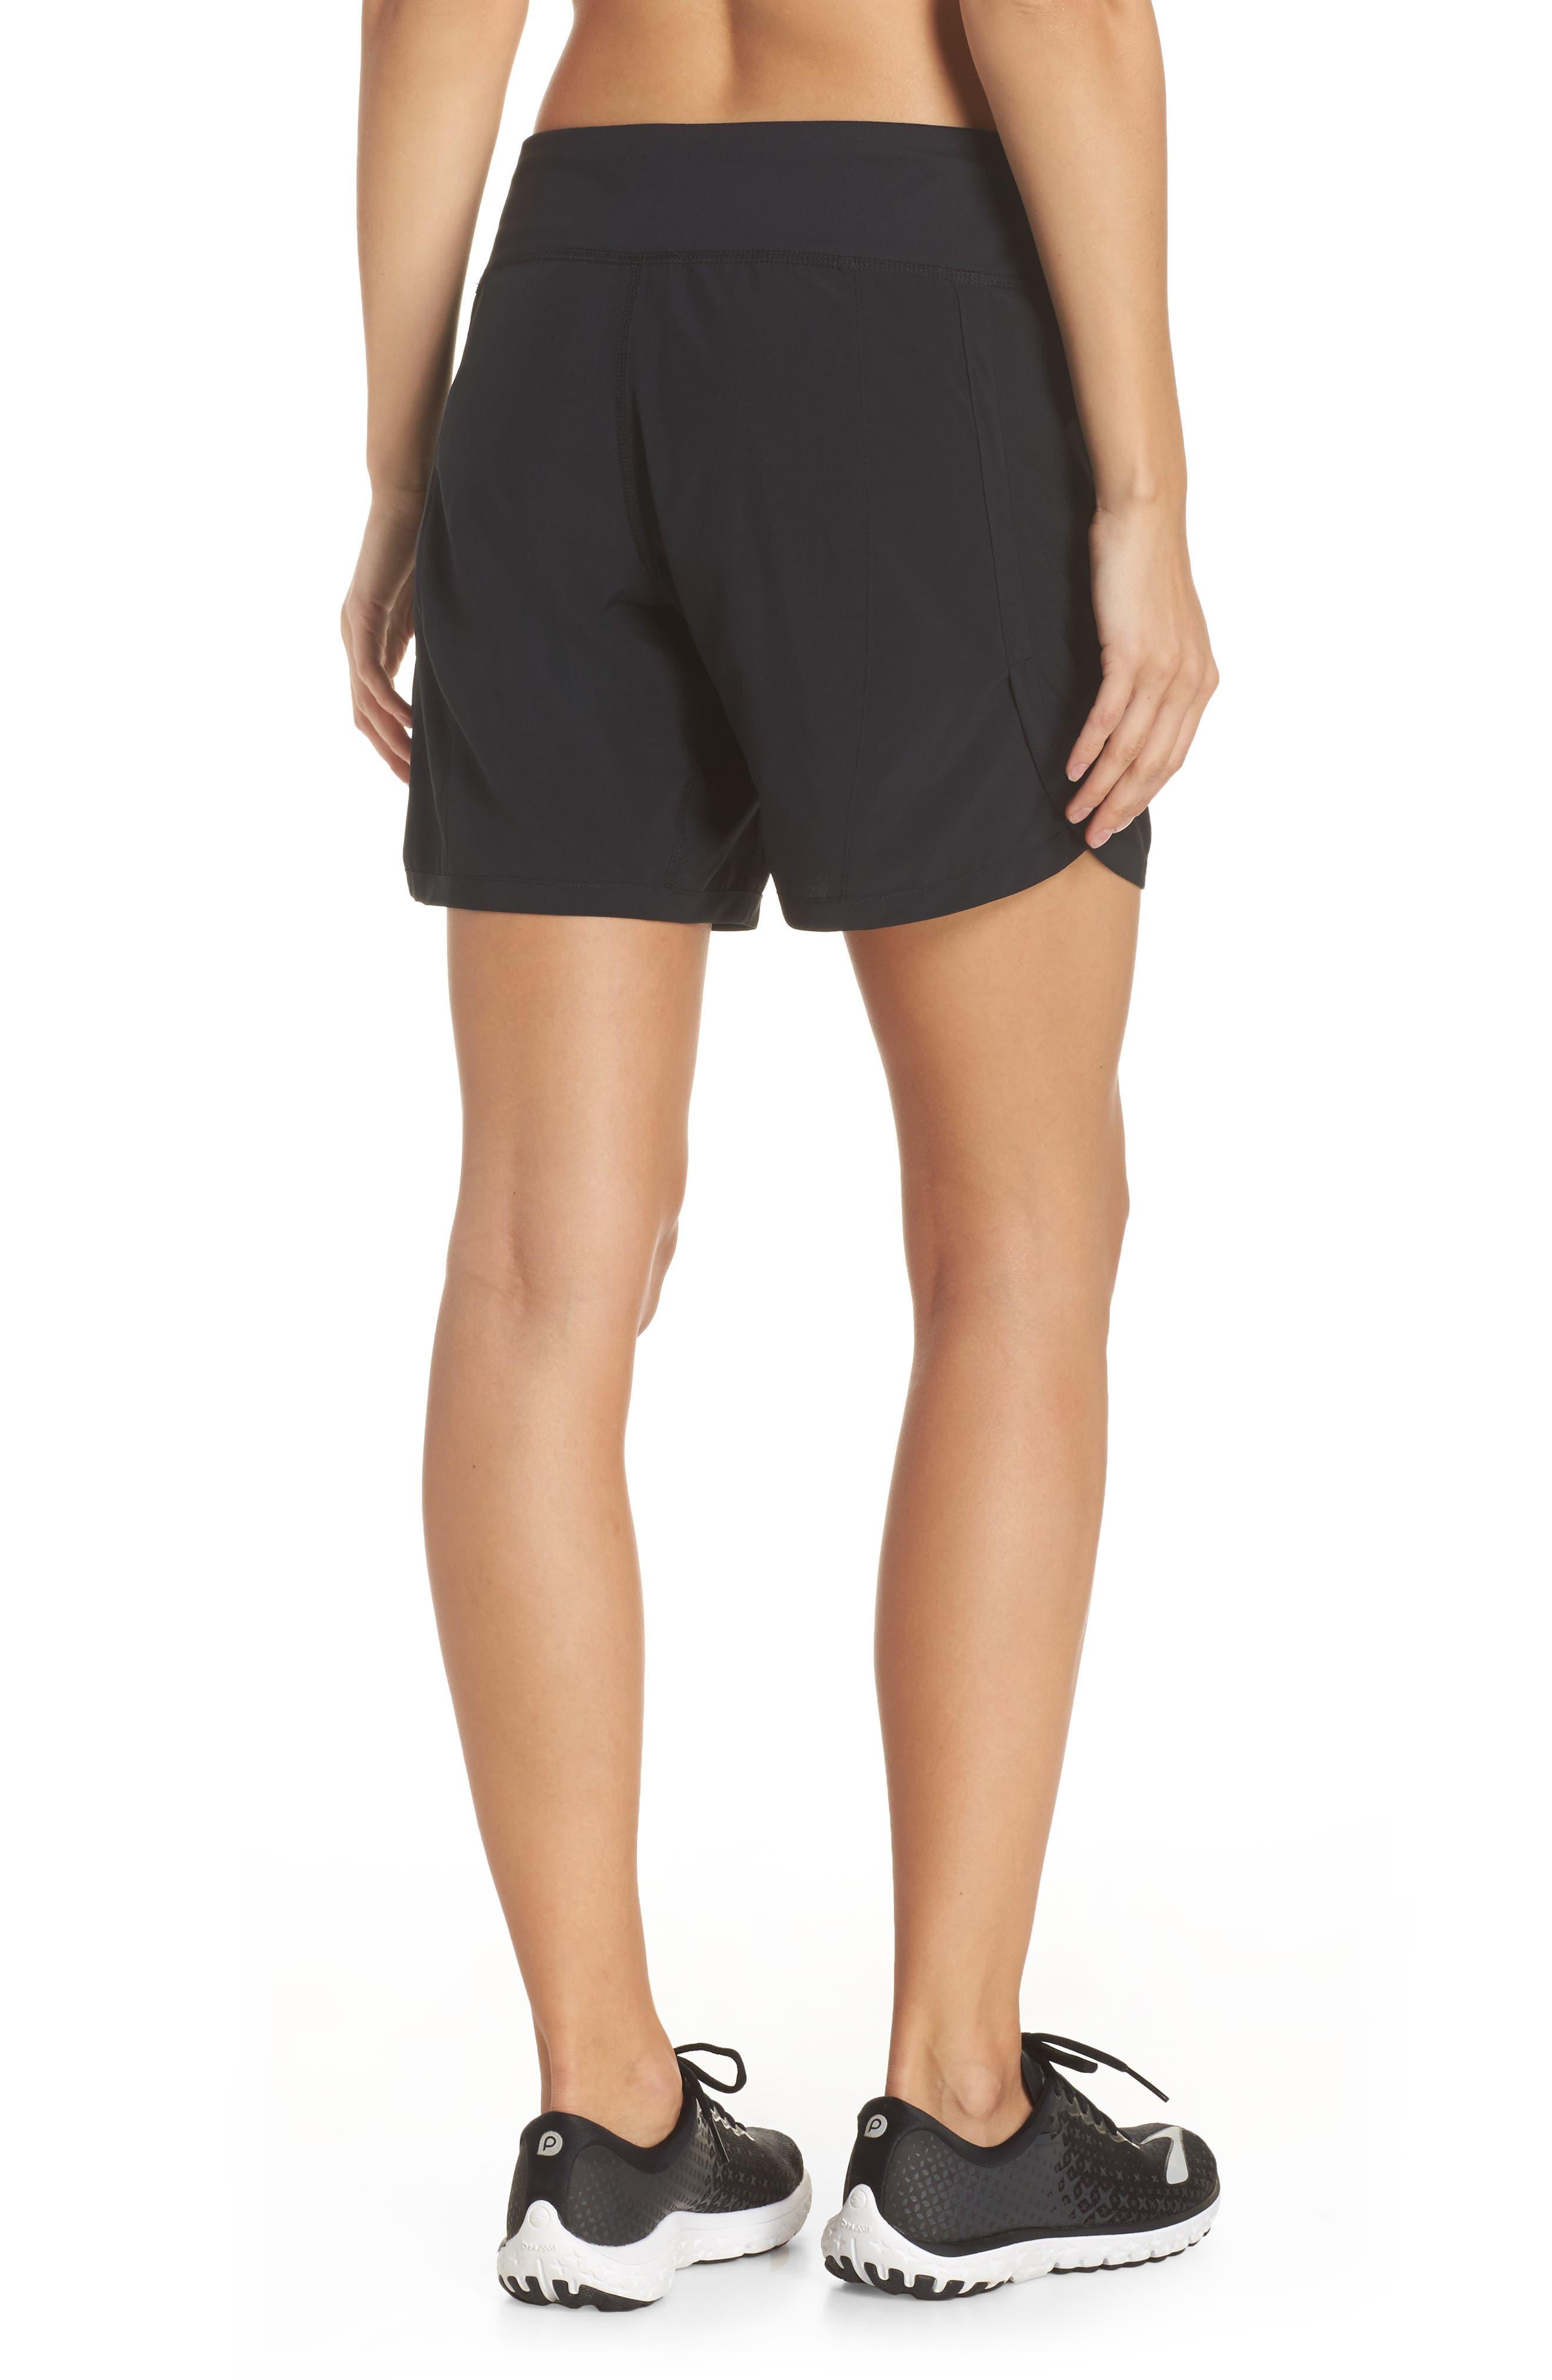 Chaser 7 Shorts,                             Alternate thumbnail 2, color,                             Black